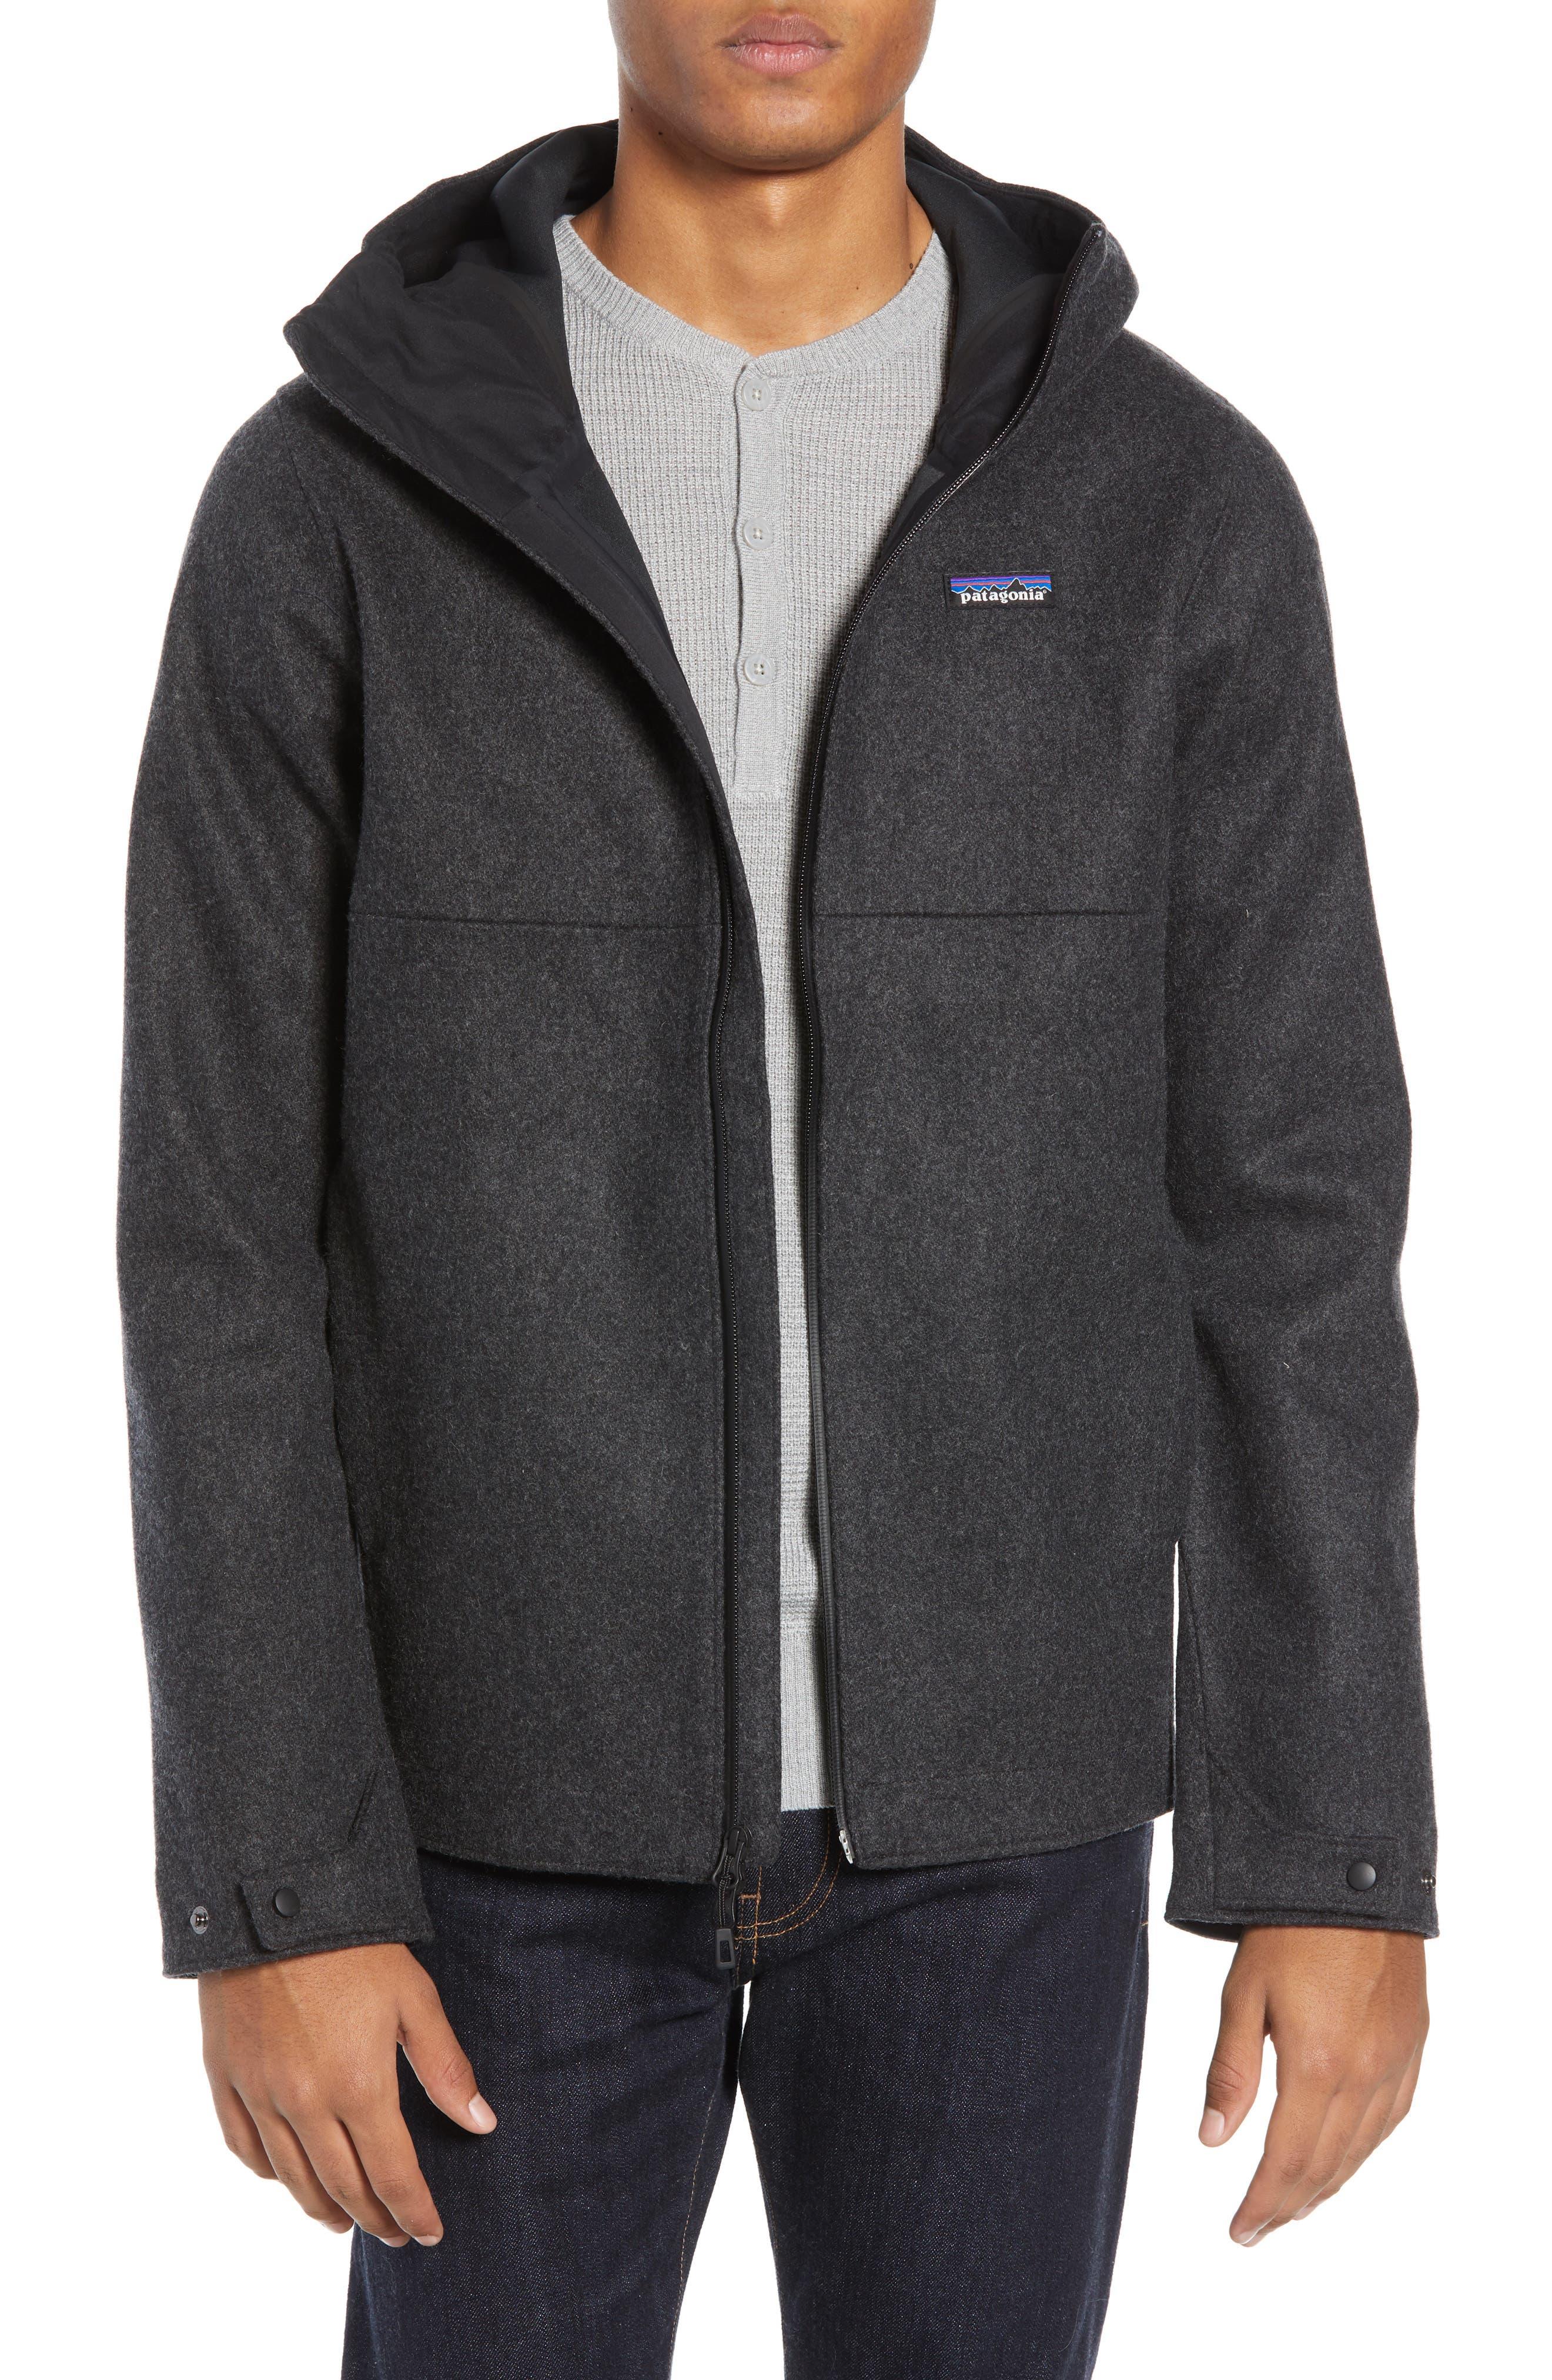 Patagonia Woolyester Hooded Jacket, Grey